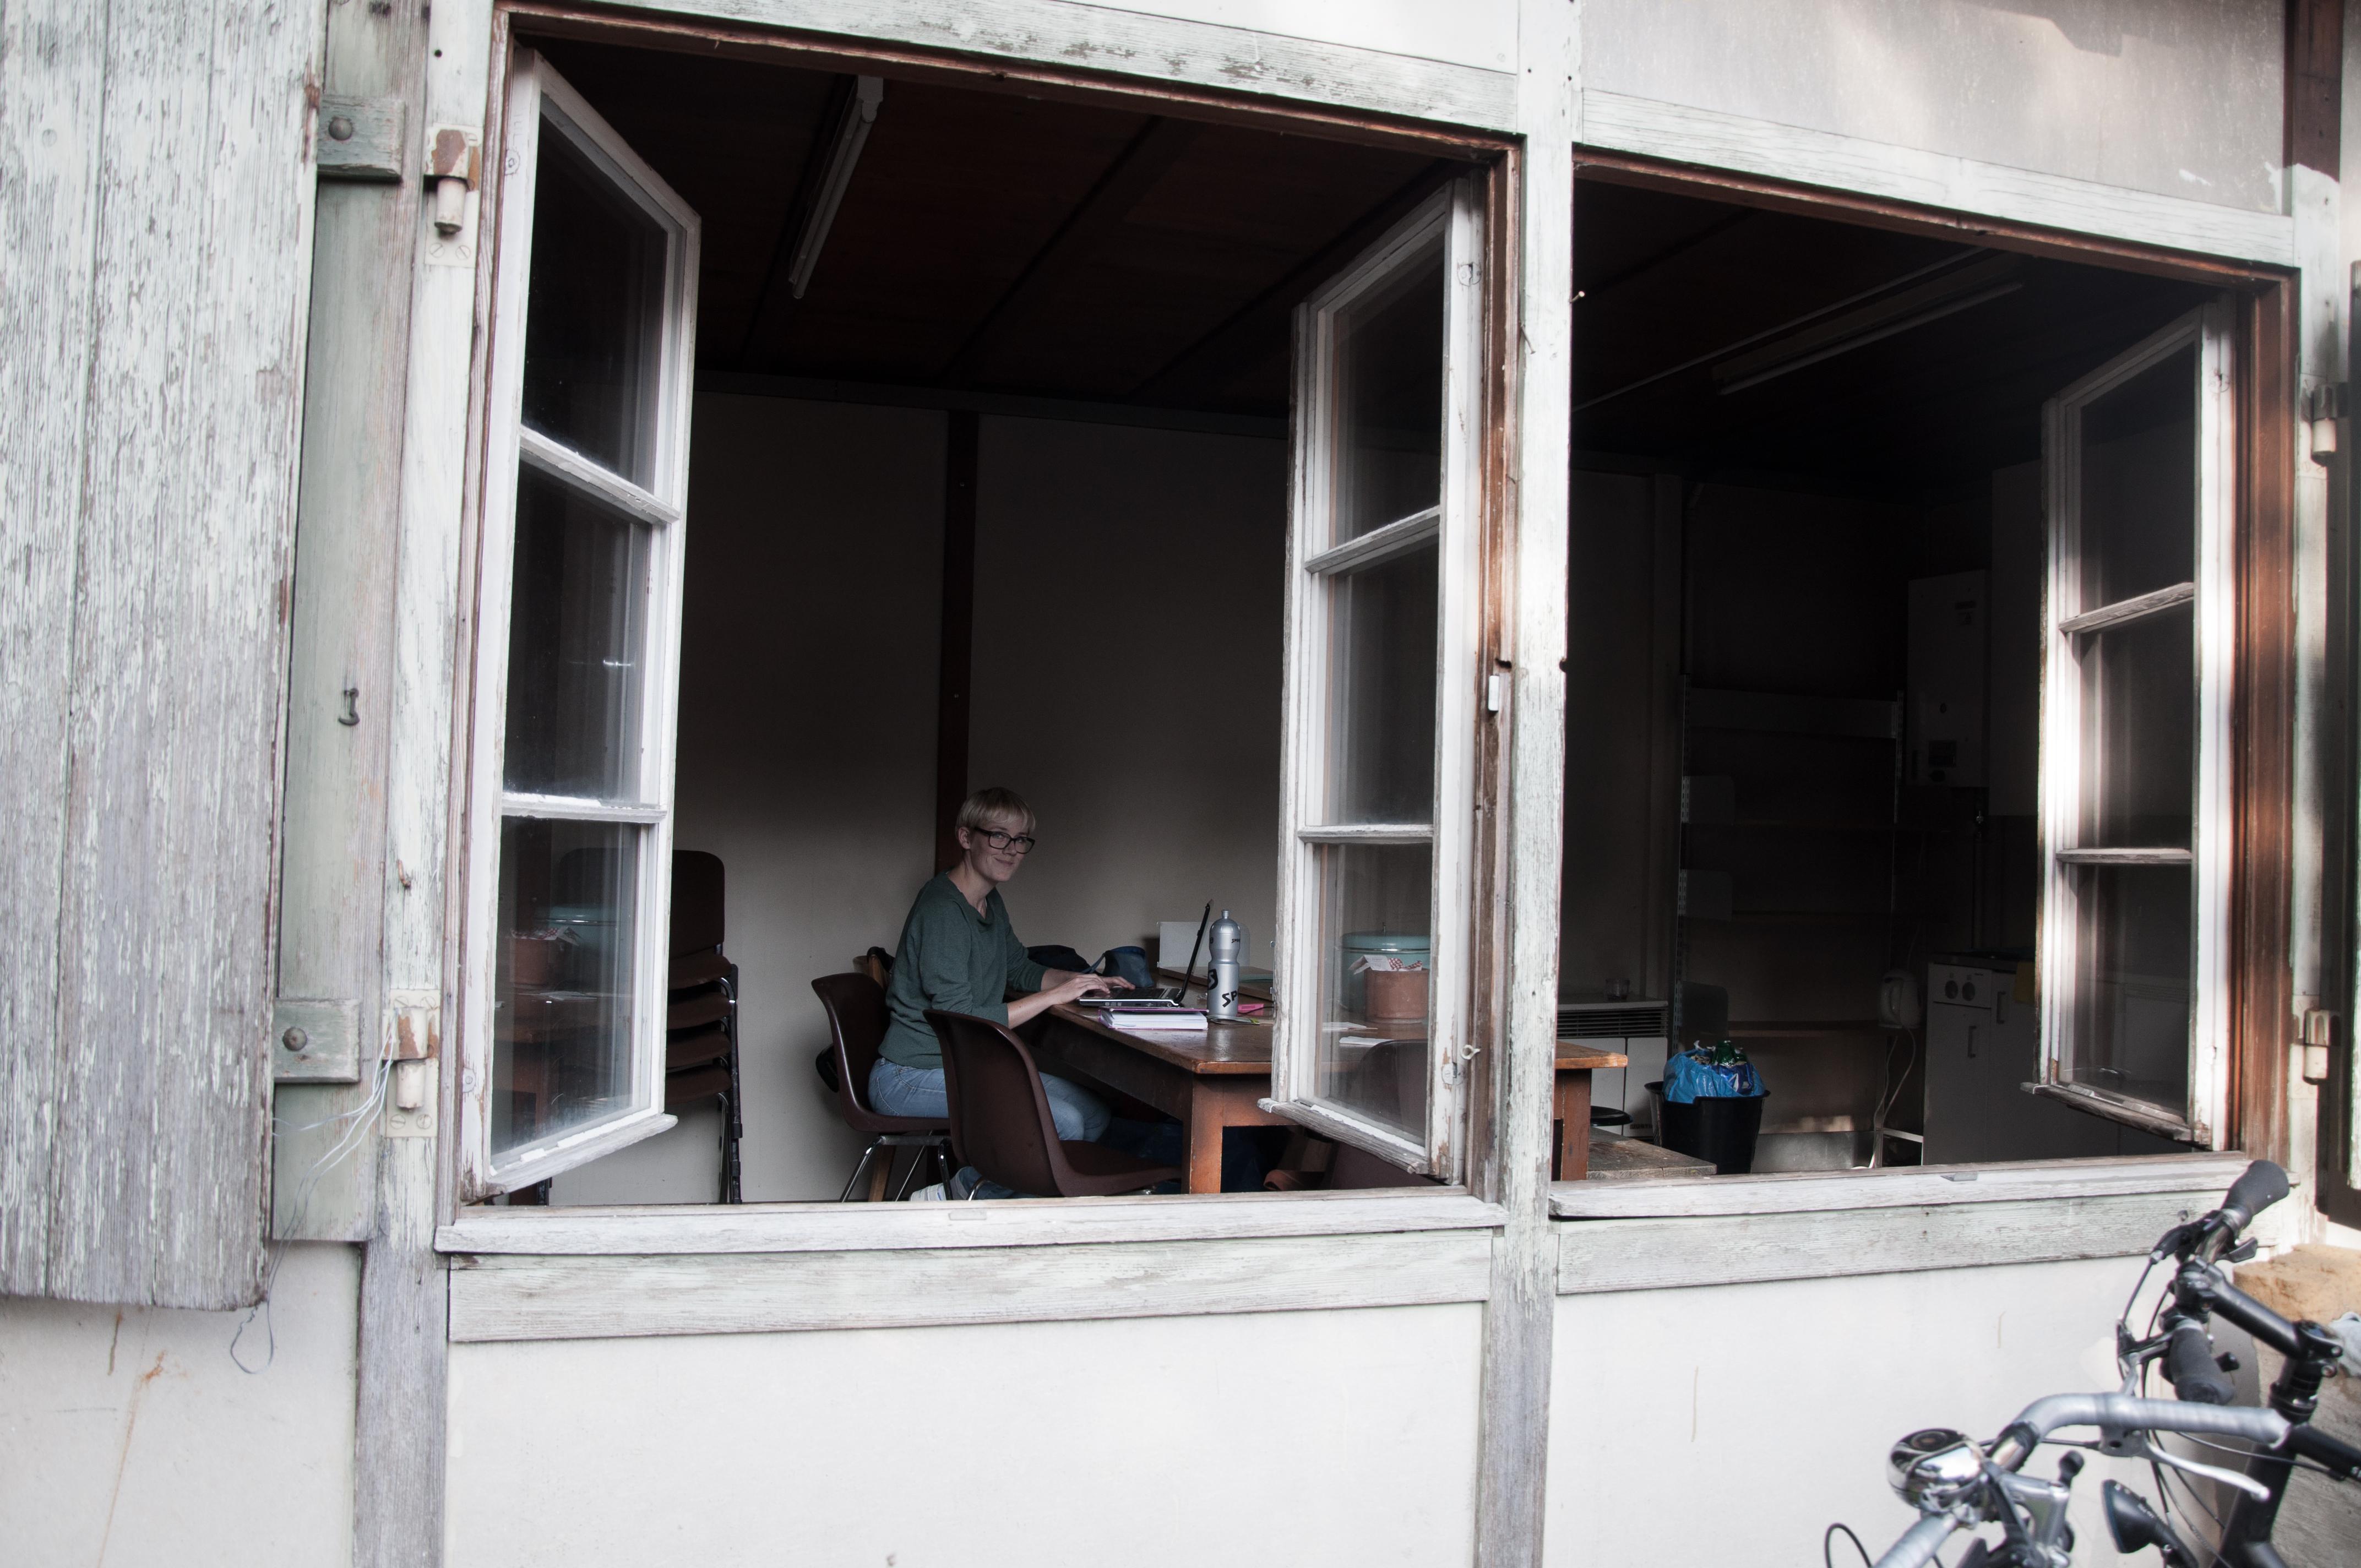 Susannah Sundman im Gemeinschaftsraum. Hier kann gearbeitet, gekocht und sogar geduscht werden.